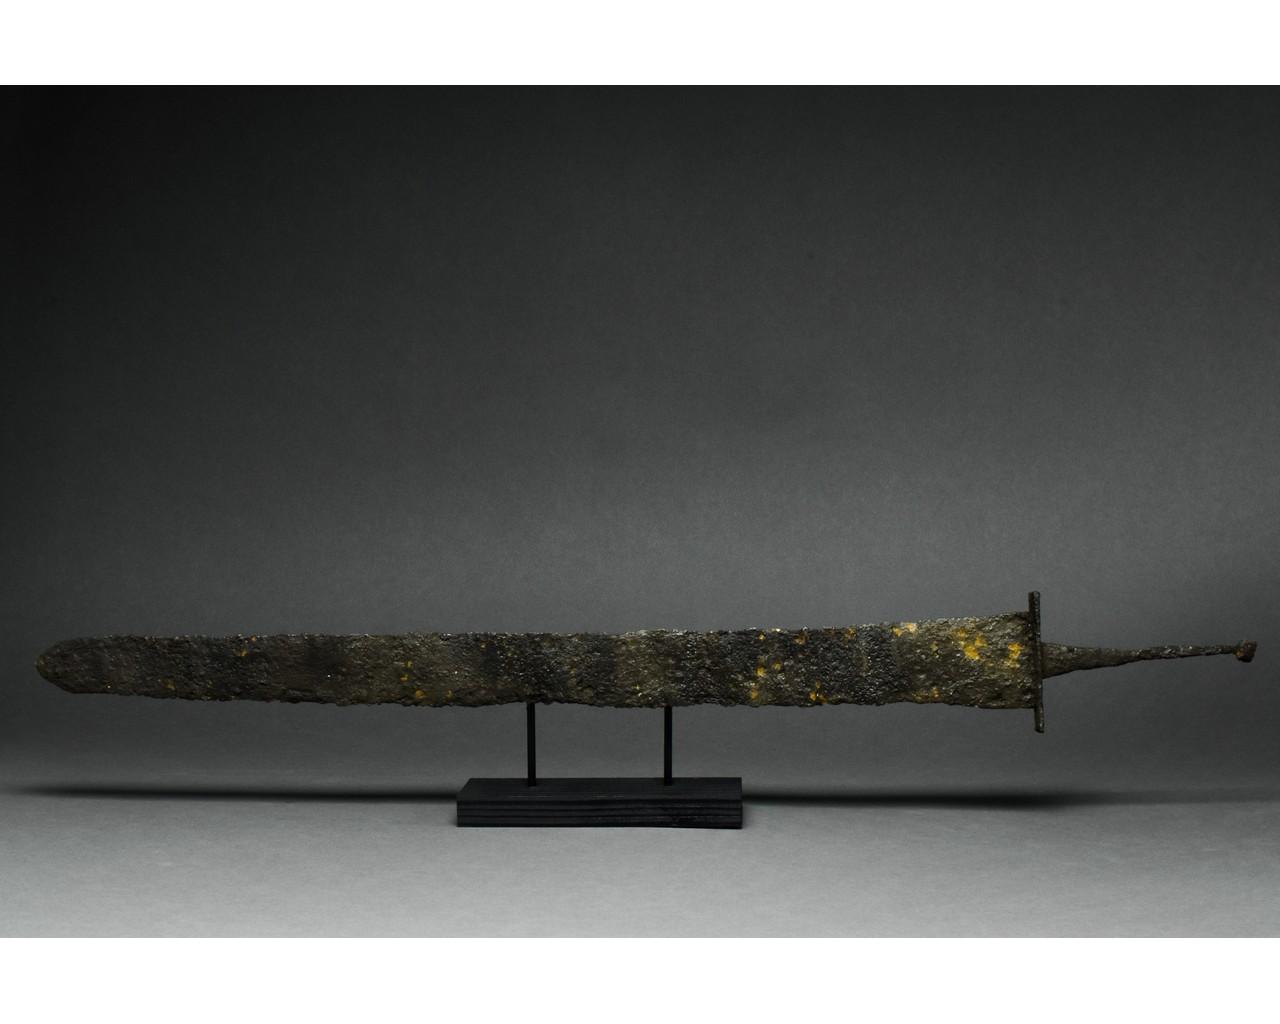 LATE ROMAN IRON SPATHA SWORD - Image 3 of 7